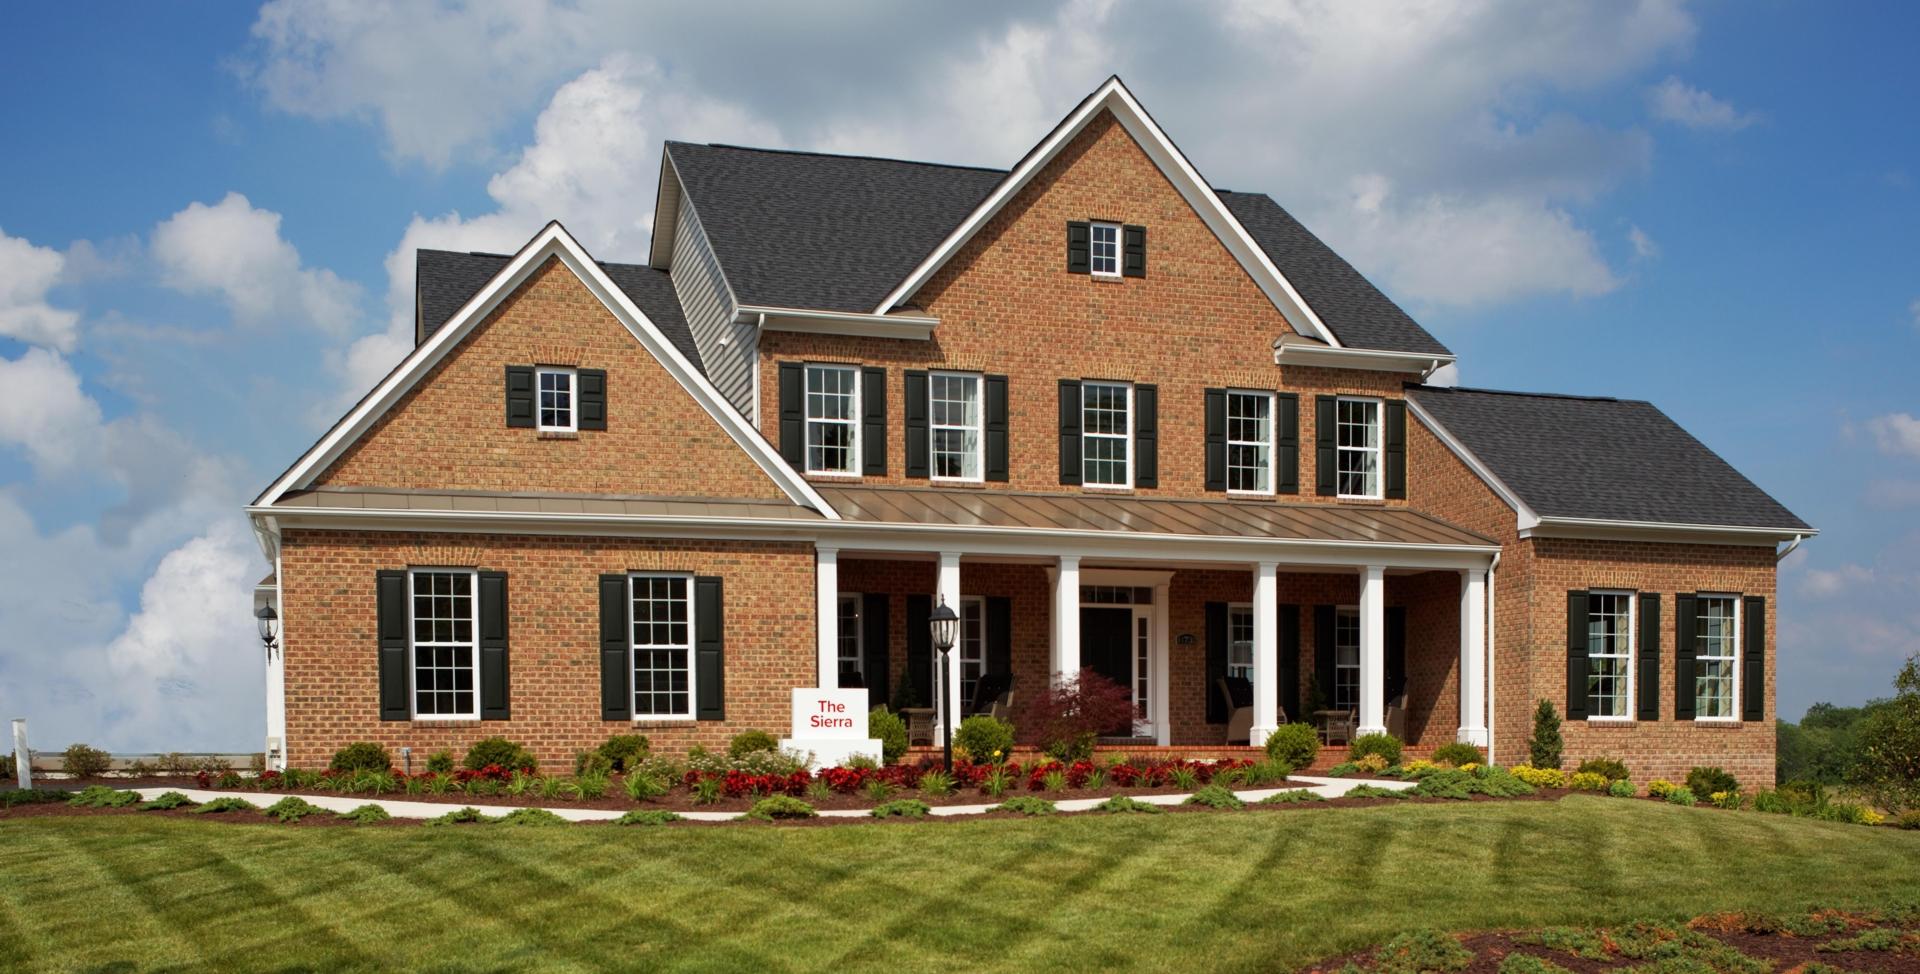 Single family home in md va sierra 2 0 mid atlantic for Mid atlantic home builders